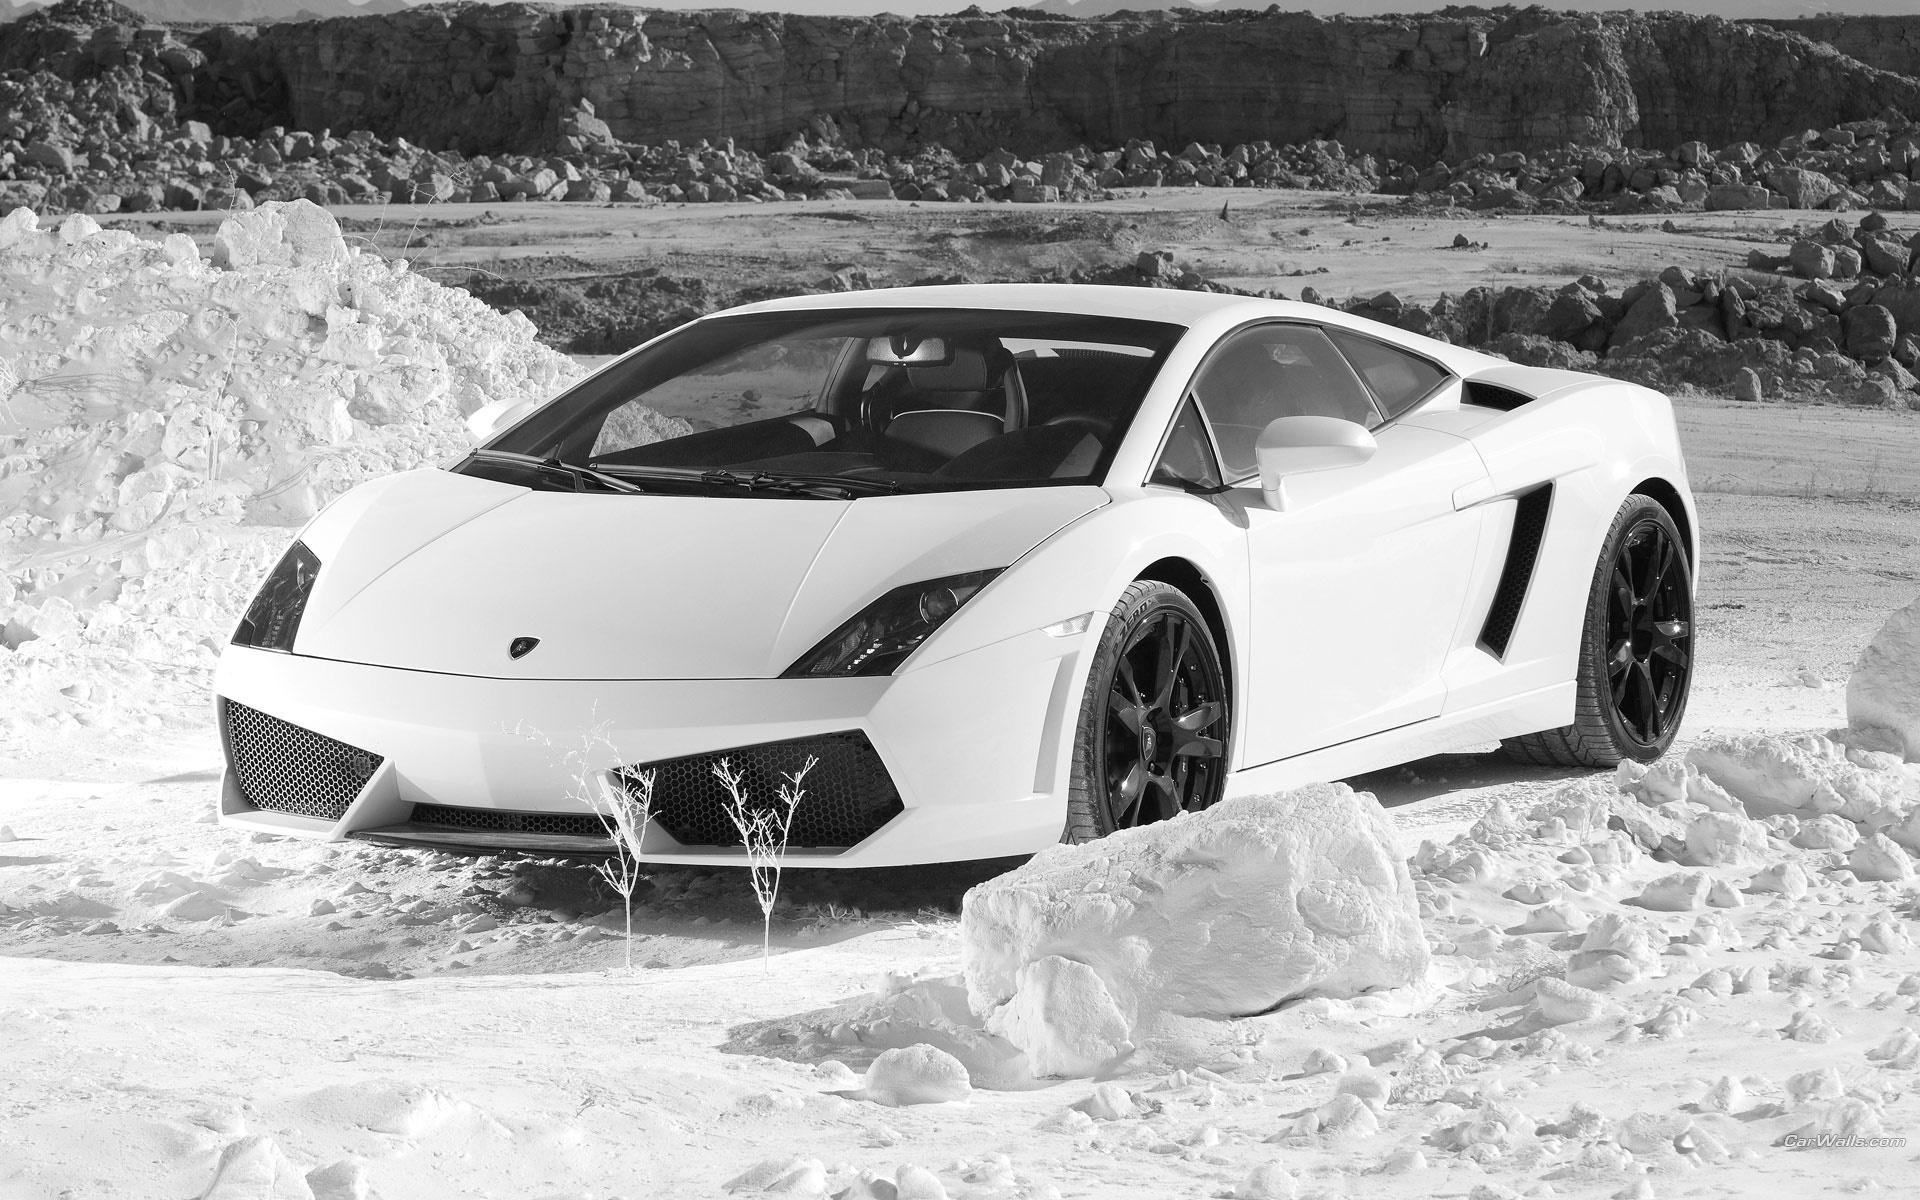 Awesome White Lamborghini Wallpaper